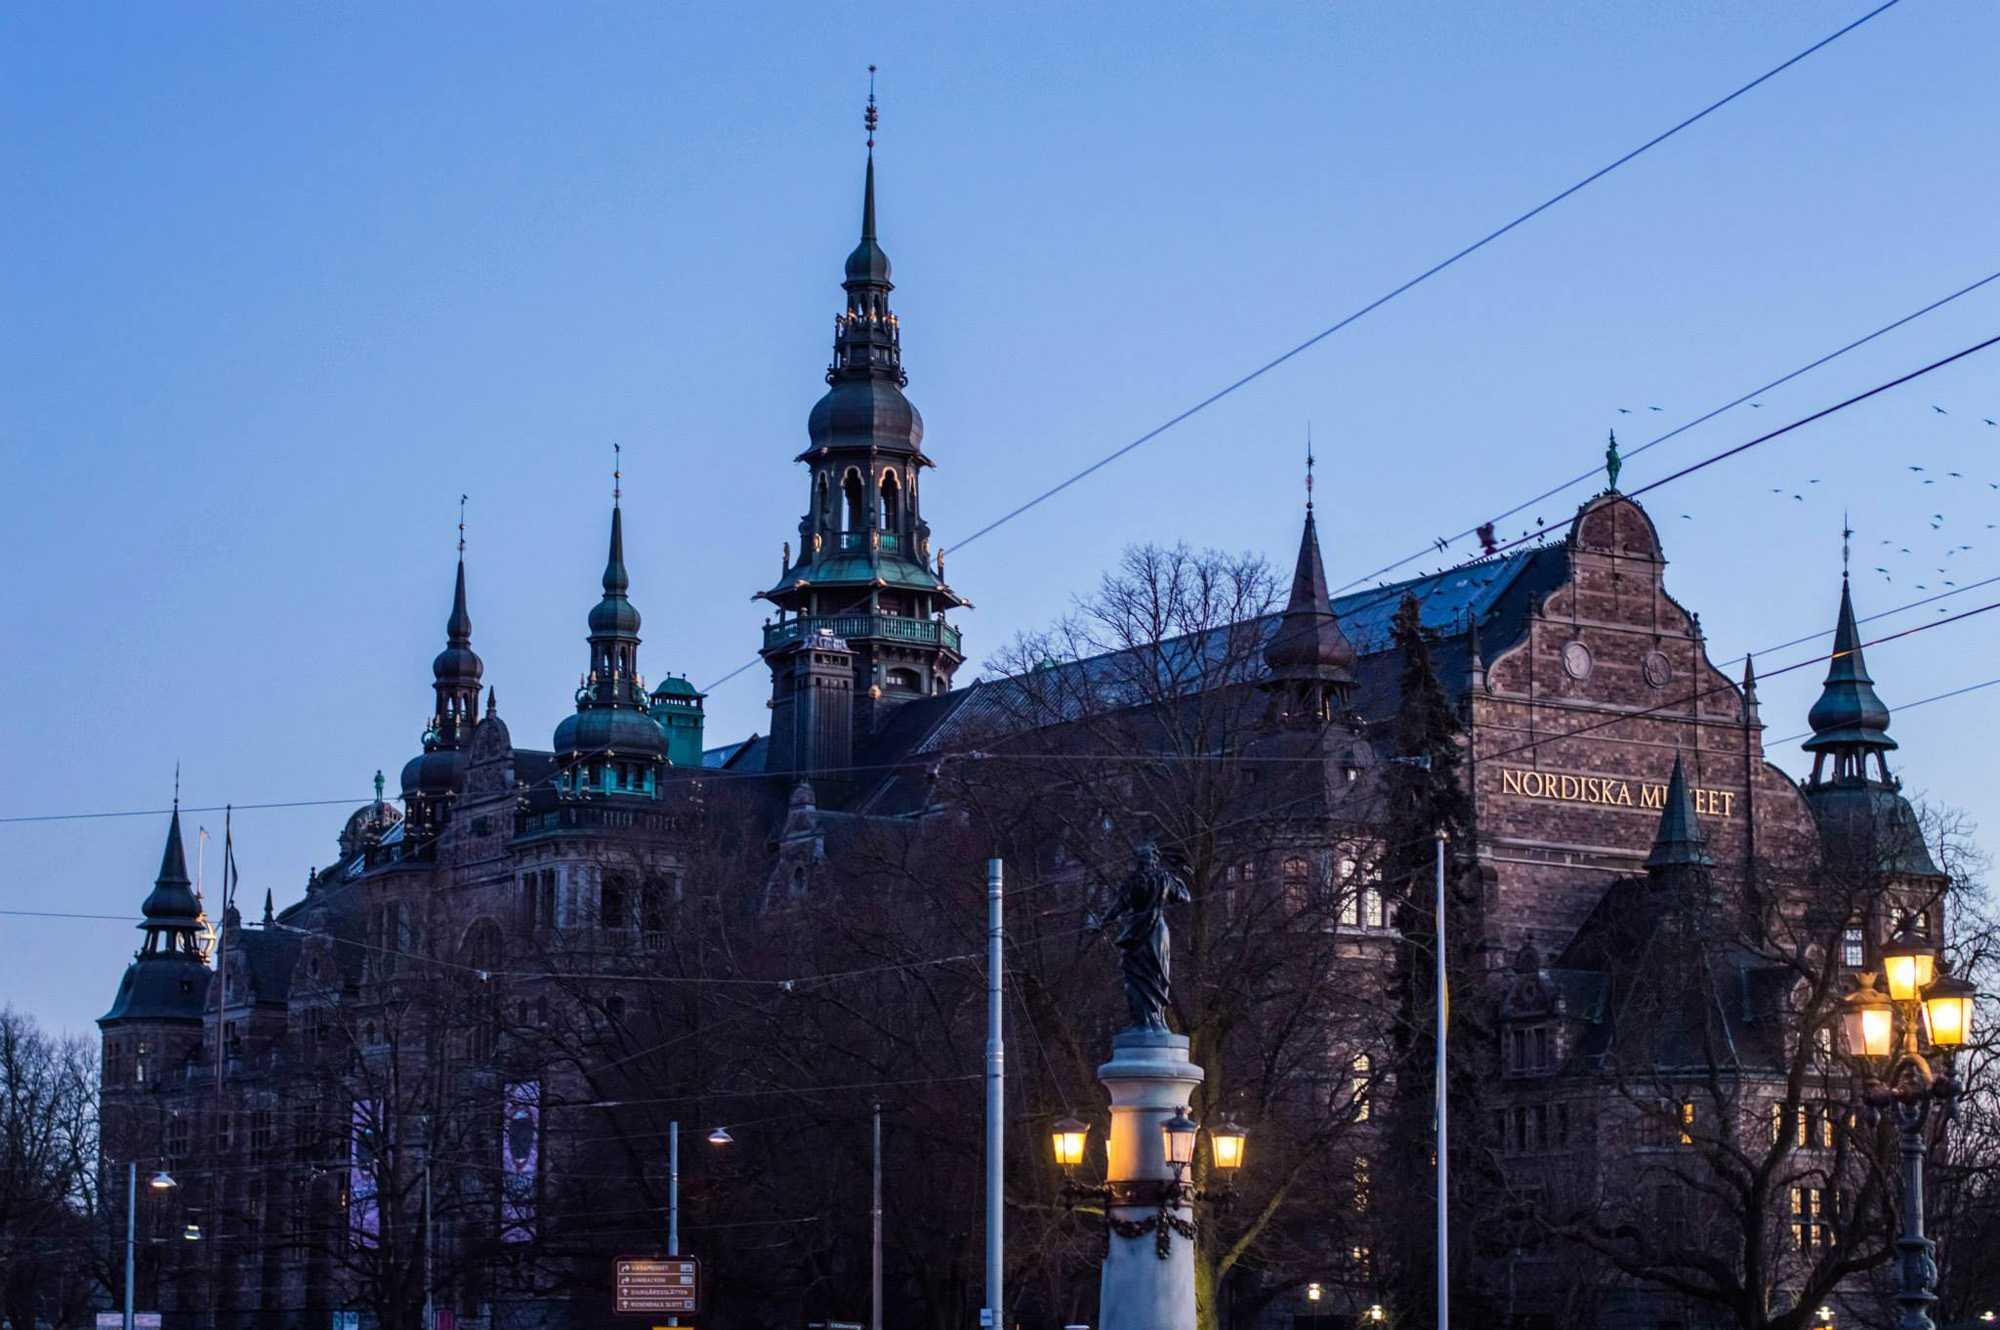 The Nordiska Museum in Stockholm.